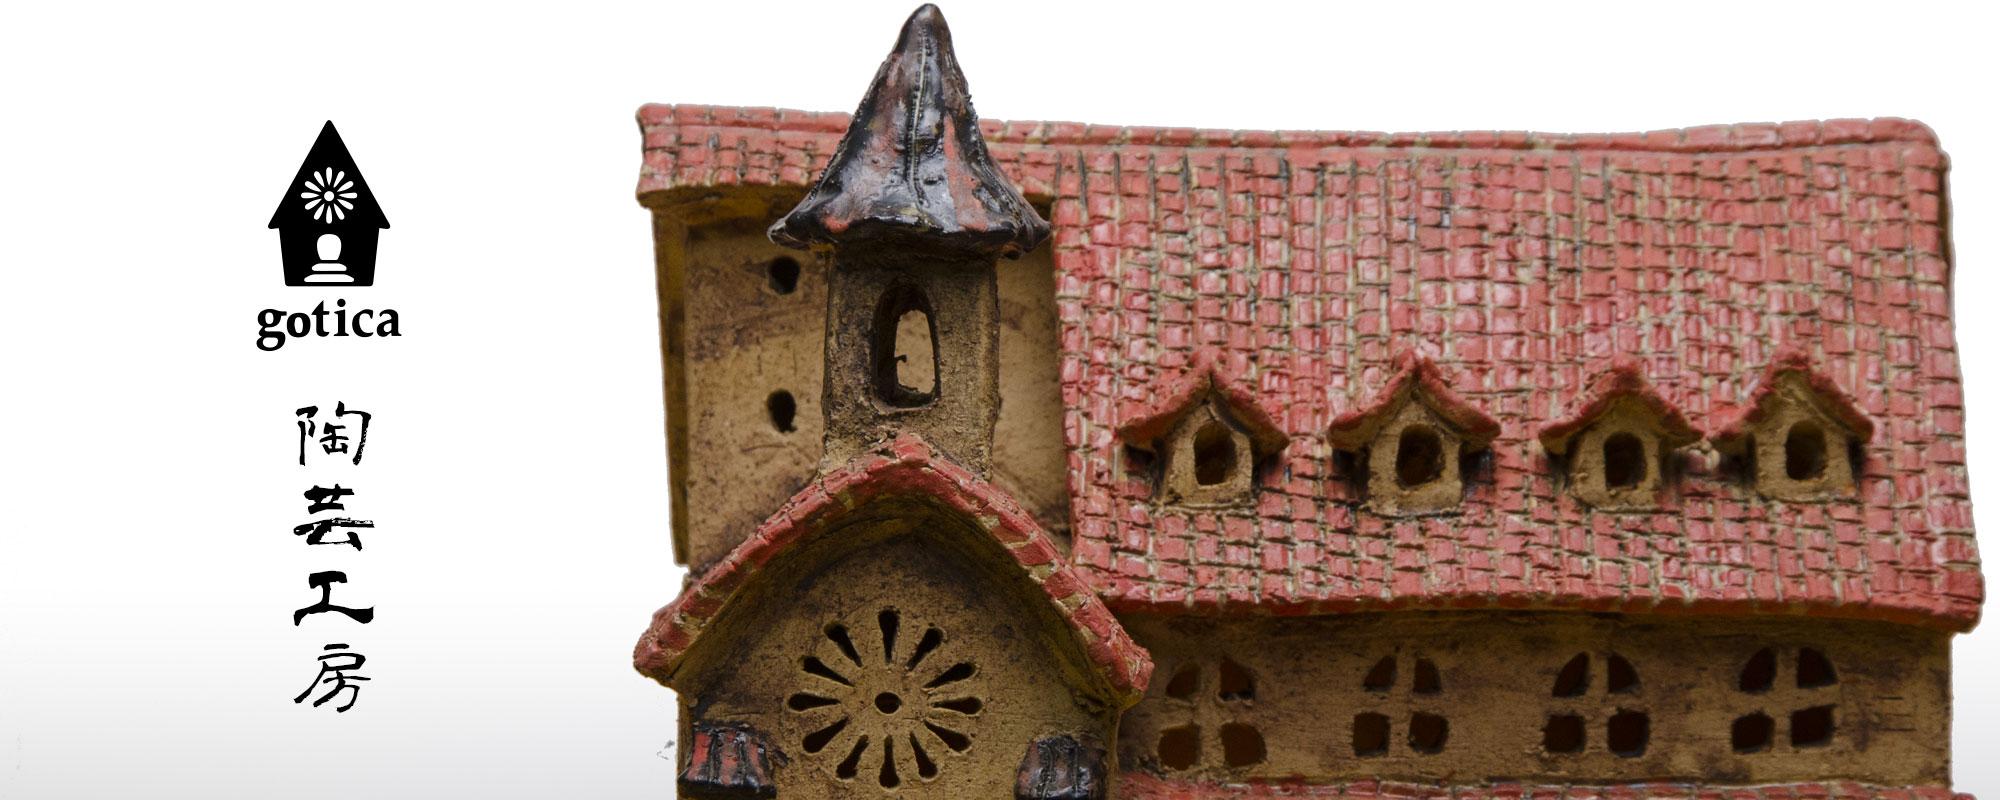 gotica 陶芸工房